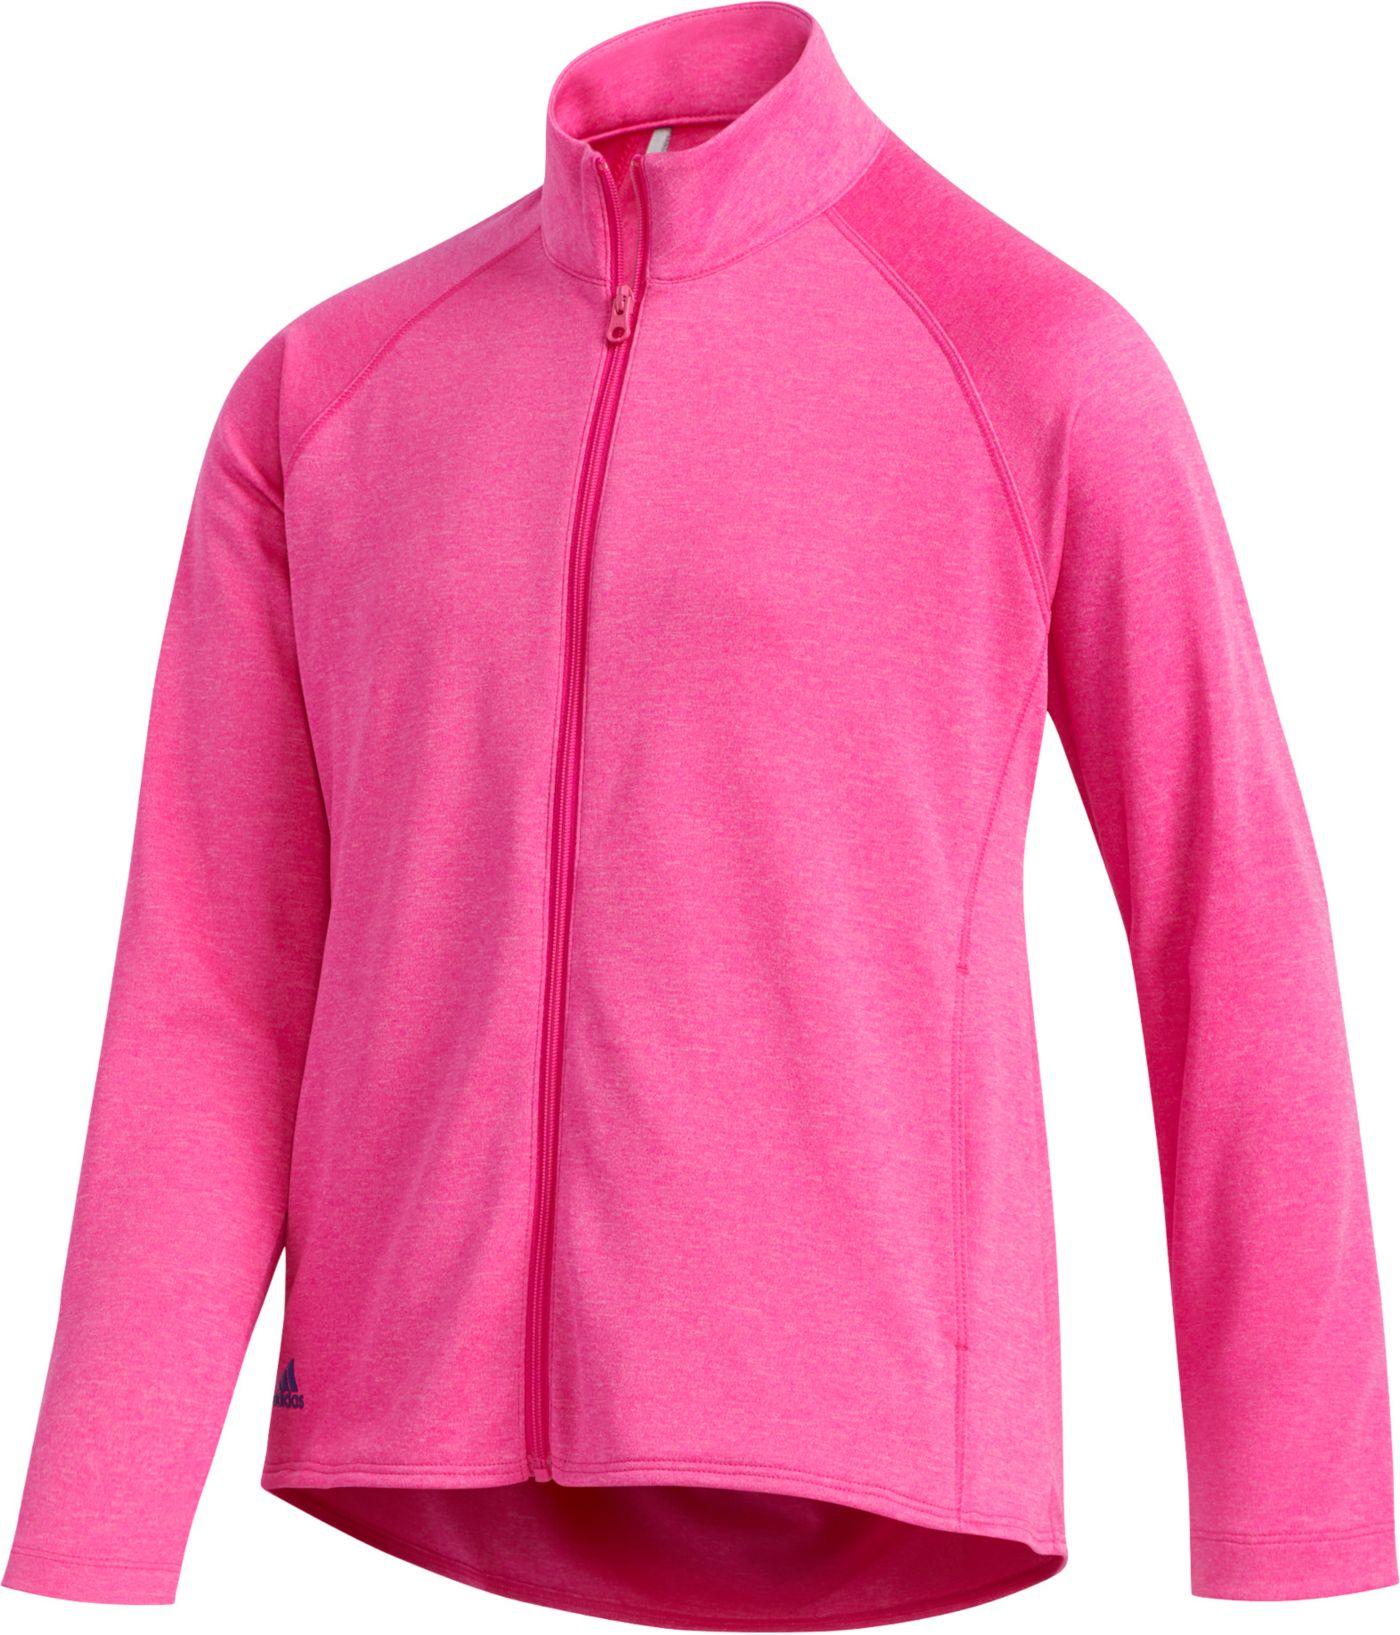 adidas Girls' Heathered Full-Zip Golf Jacket